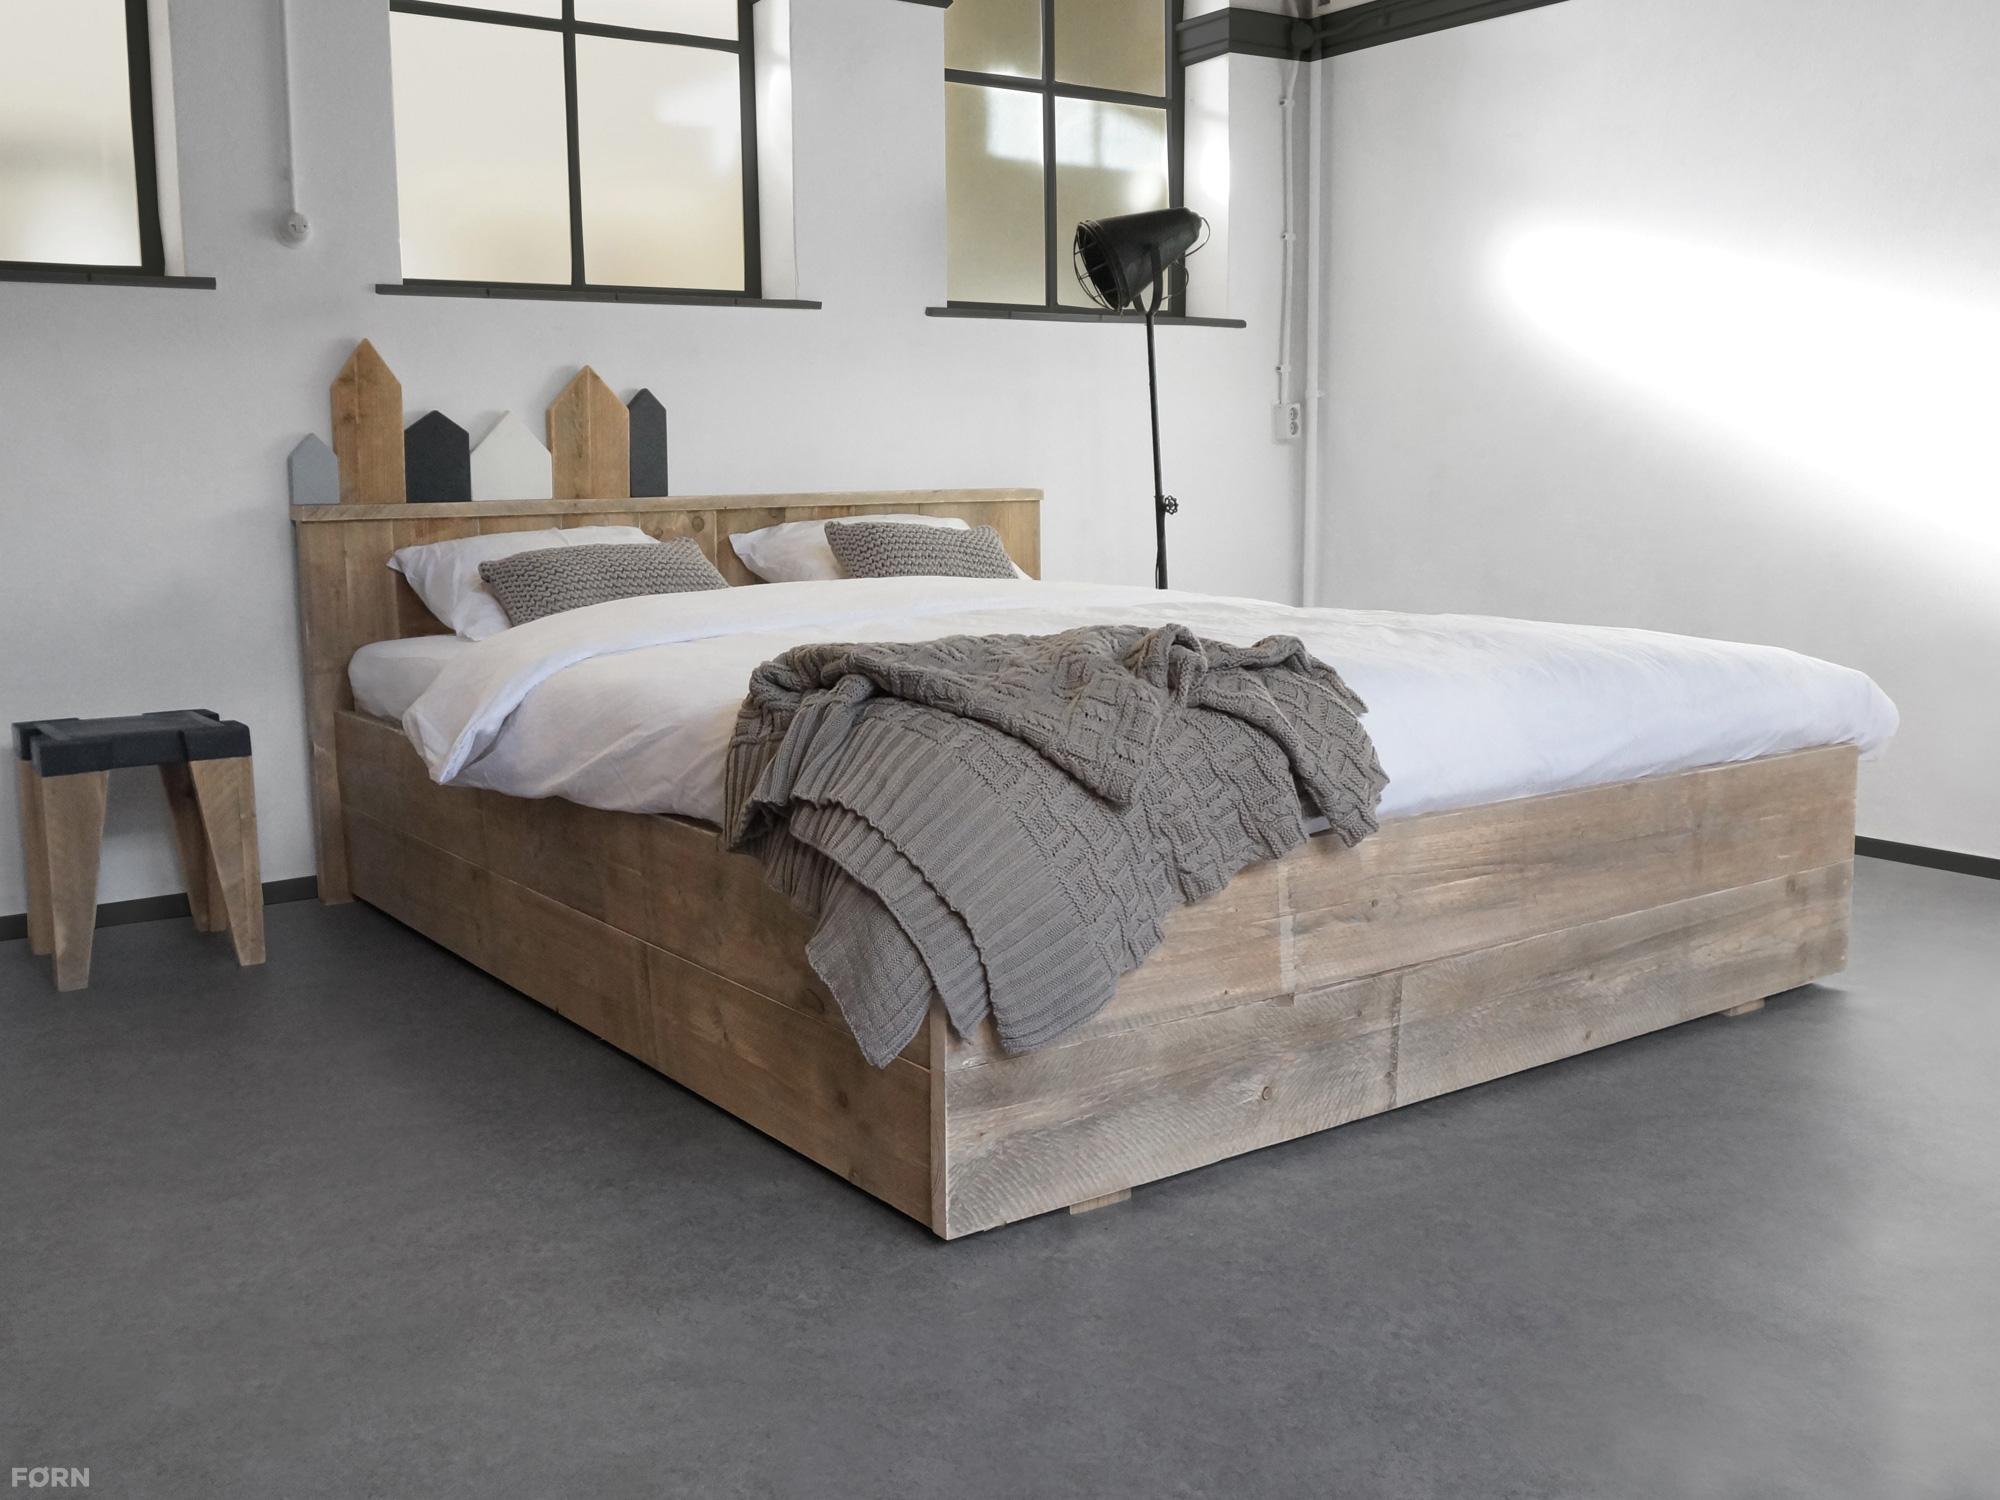 Steigerhouten bed anemone f rn for Bed van steigerhout maken